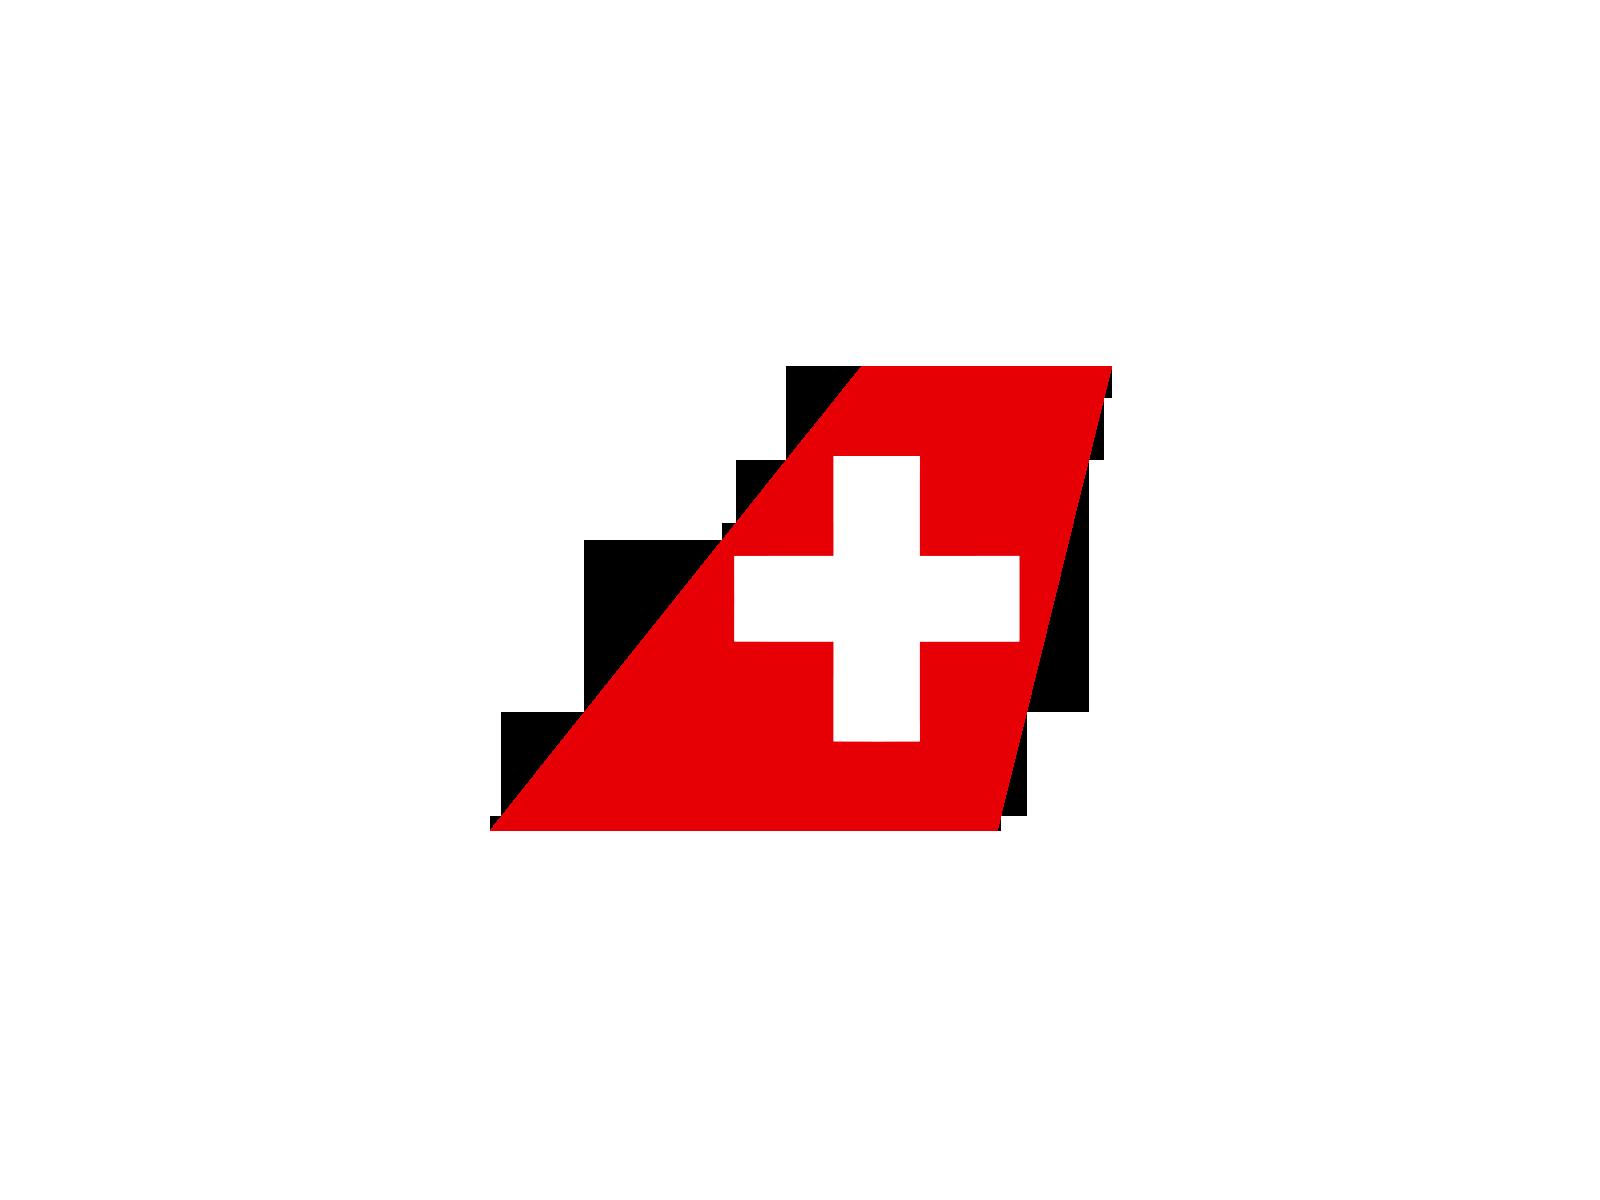 Swiss International Air Lines Png Hdpng.com 1600 - Swiss International Air Lines, Transparent background PNG HD thumbnail